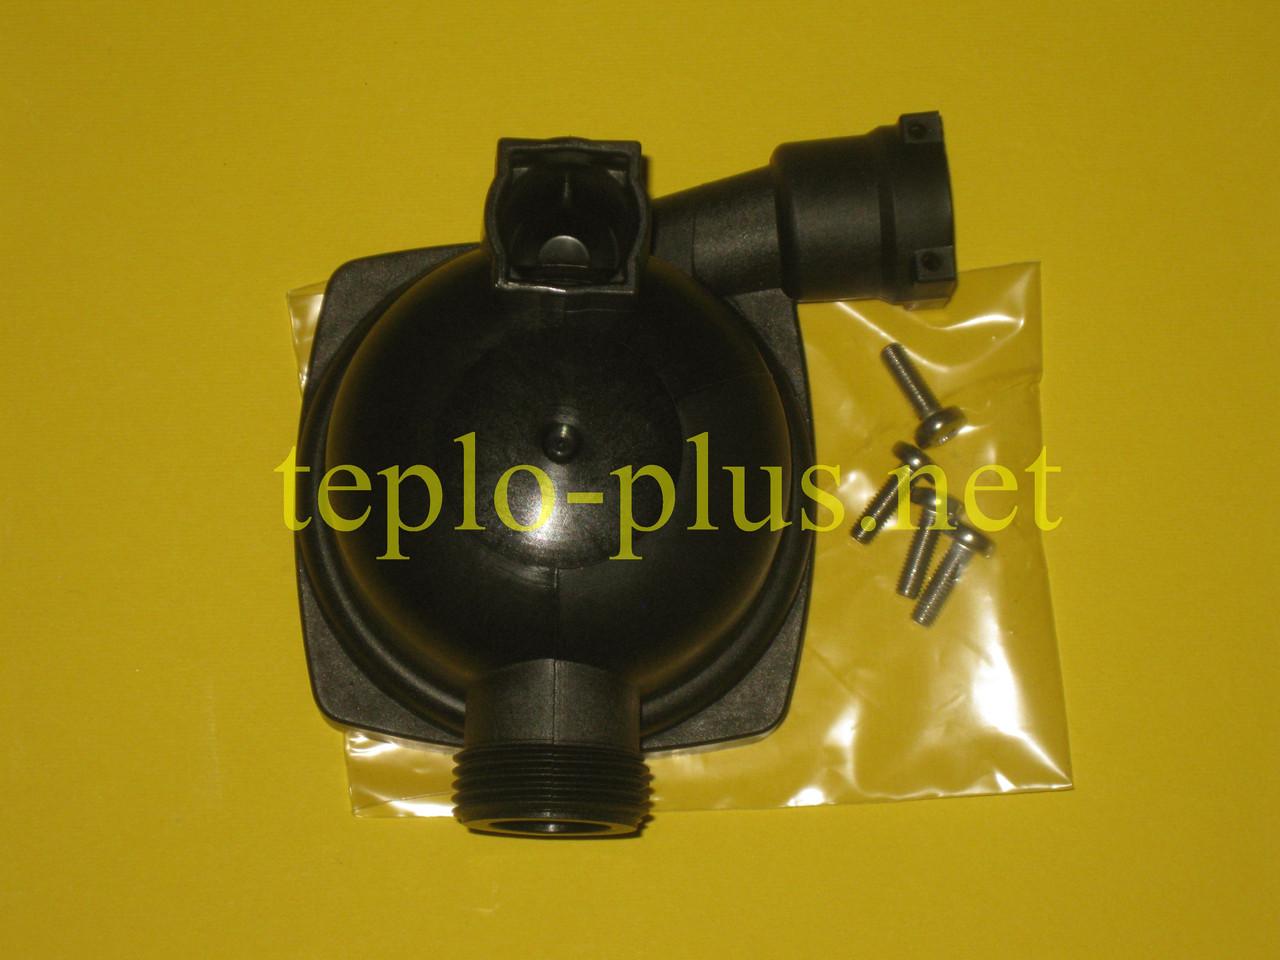 Задняя часть (корпус, улитка) насоса 8716103601 Bosch Gaz 4000 W ZSA24-2 AD/KD, ZWA24-2 A/K, ZWA24-2 AD/KD